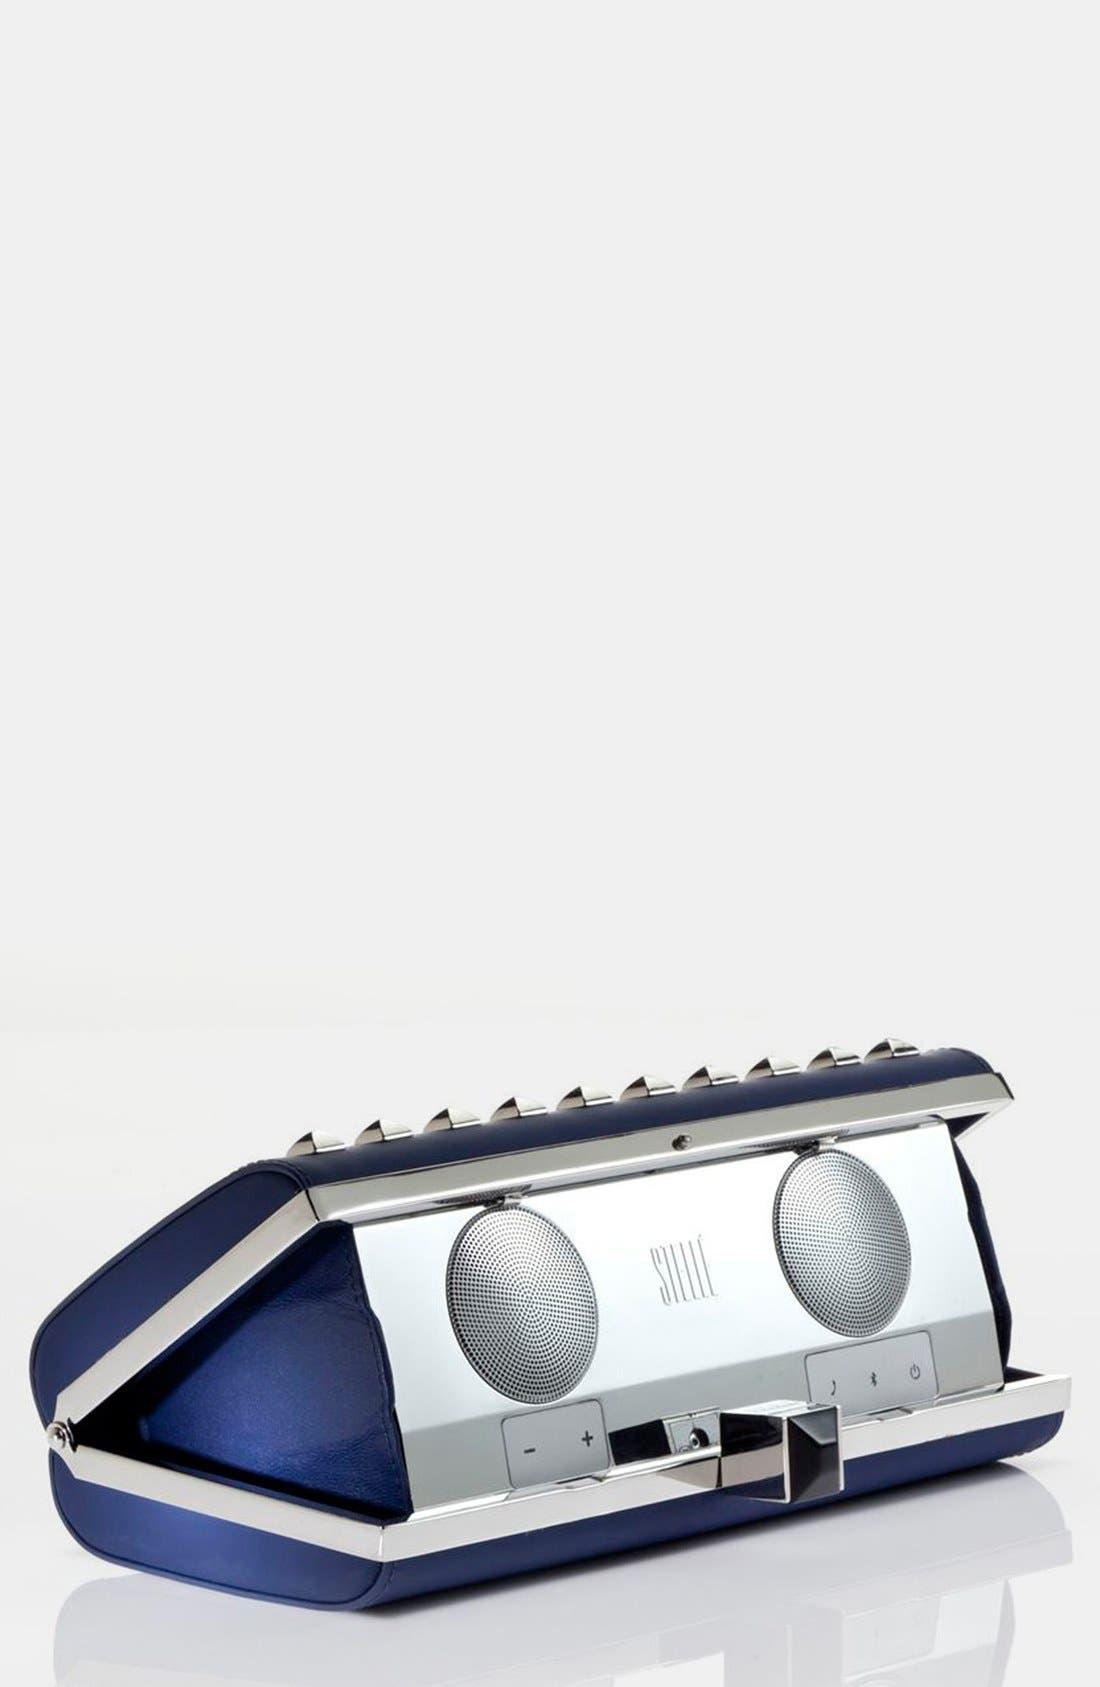 Rebecca Minkoff for Stellé Audio 'Studded Speaker' Clutch,                         Main,                         color, 401